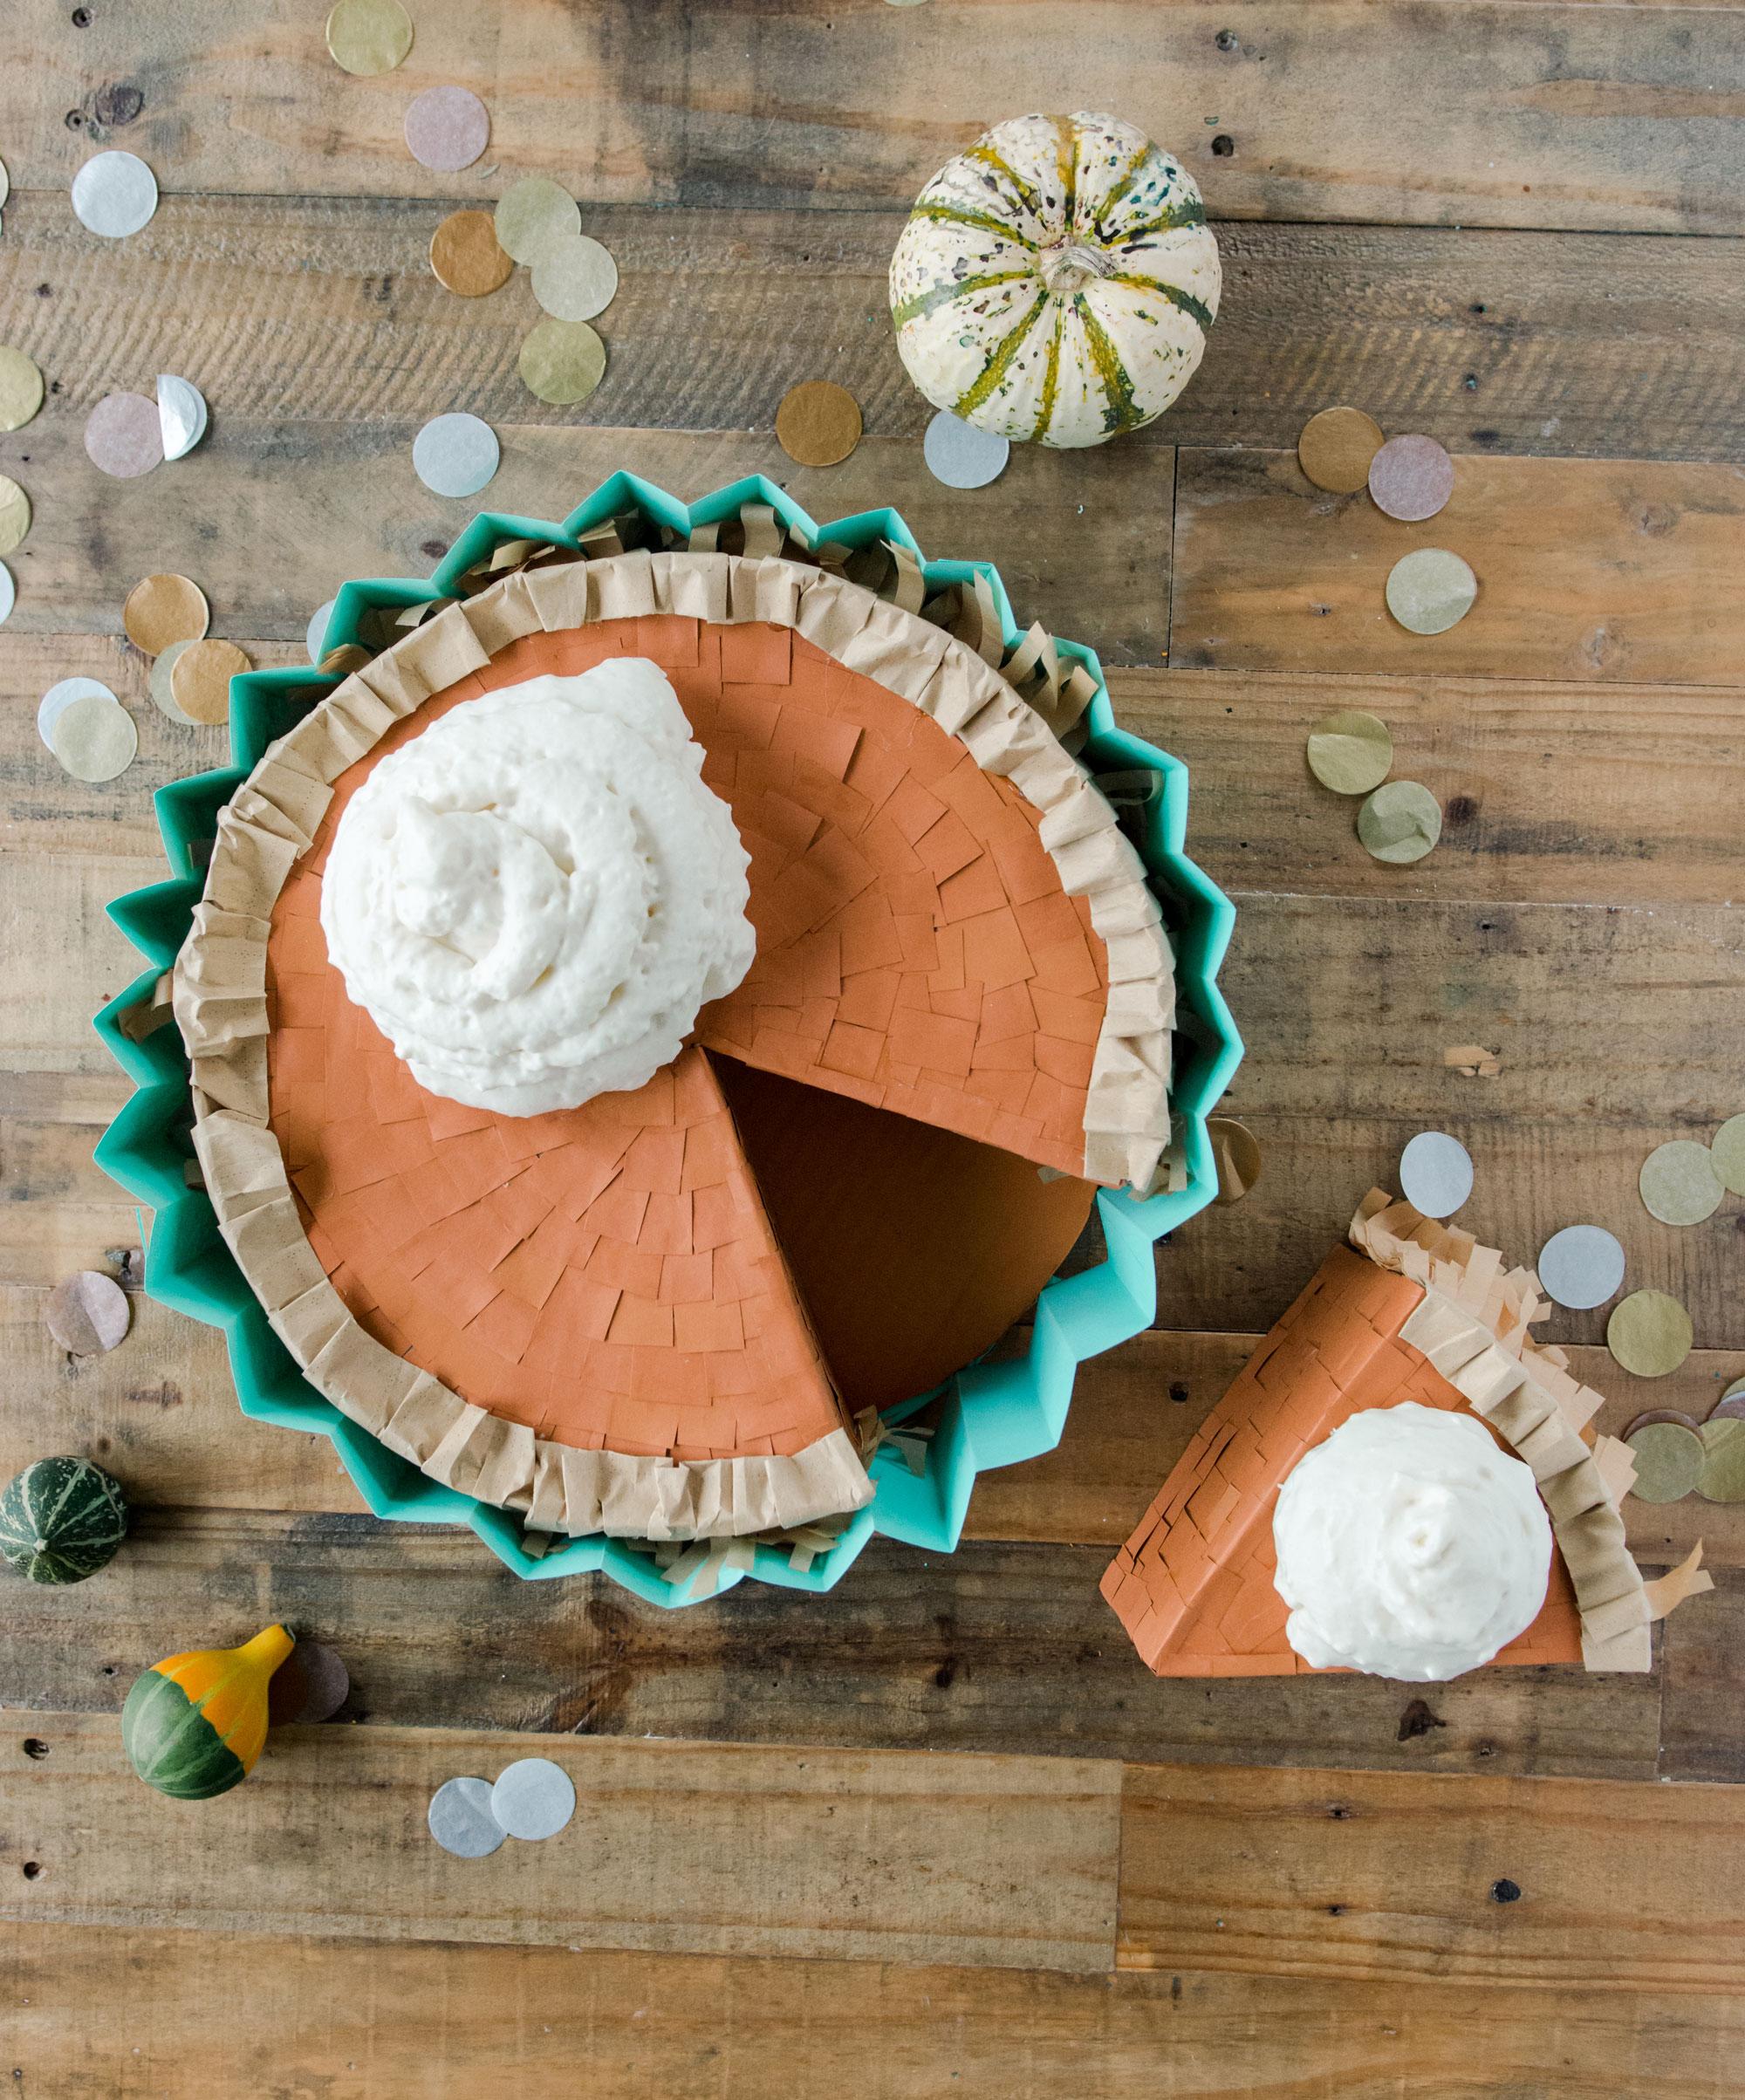 Pumpkin pie pinata, How to make a pumpkin pie pinata, Thanksgiving pinata, Thanksgiving party ideas, Friendsgiving pinata, Thanksgiving pie, Friendsgiving pie ideas, how to make a pinata, Pinata pie DIY